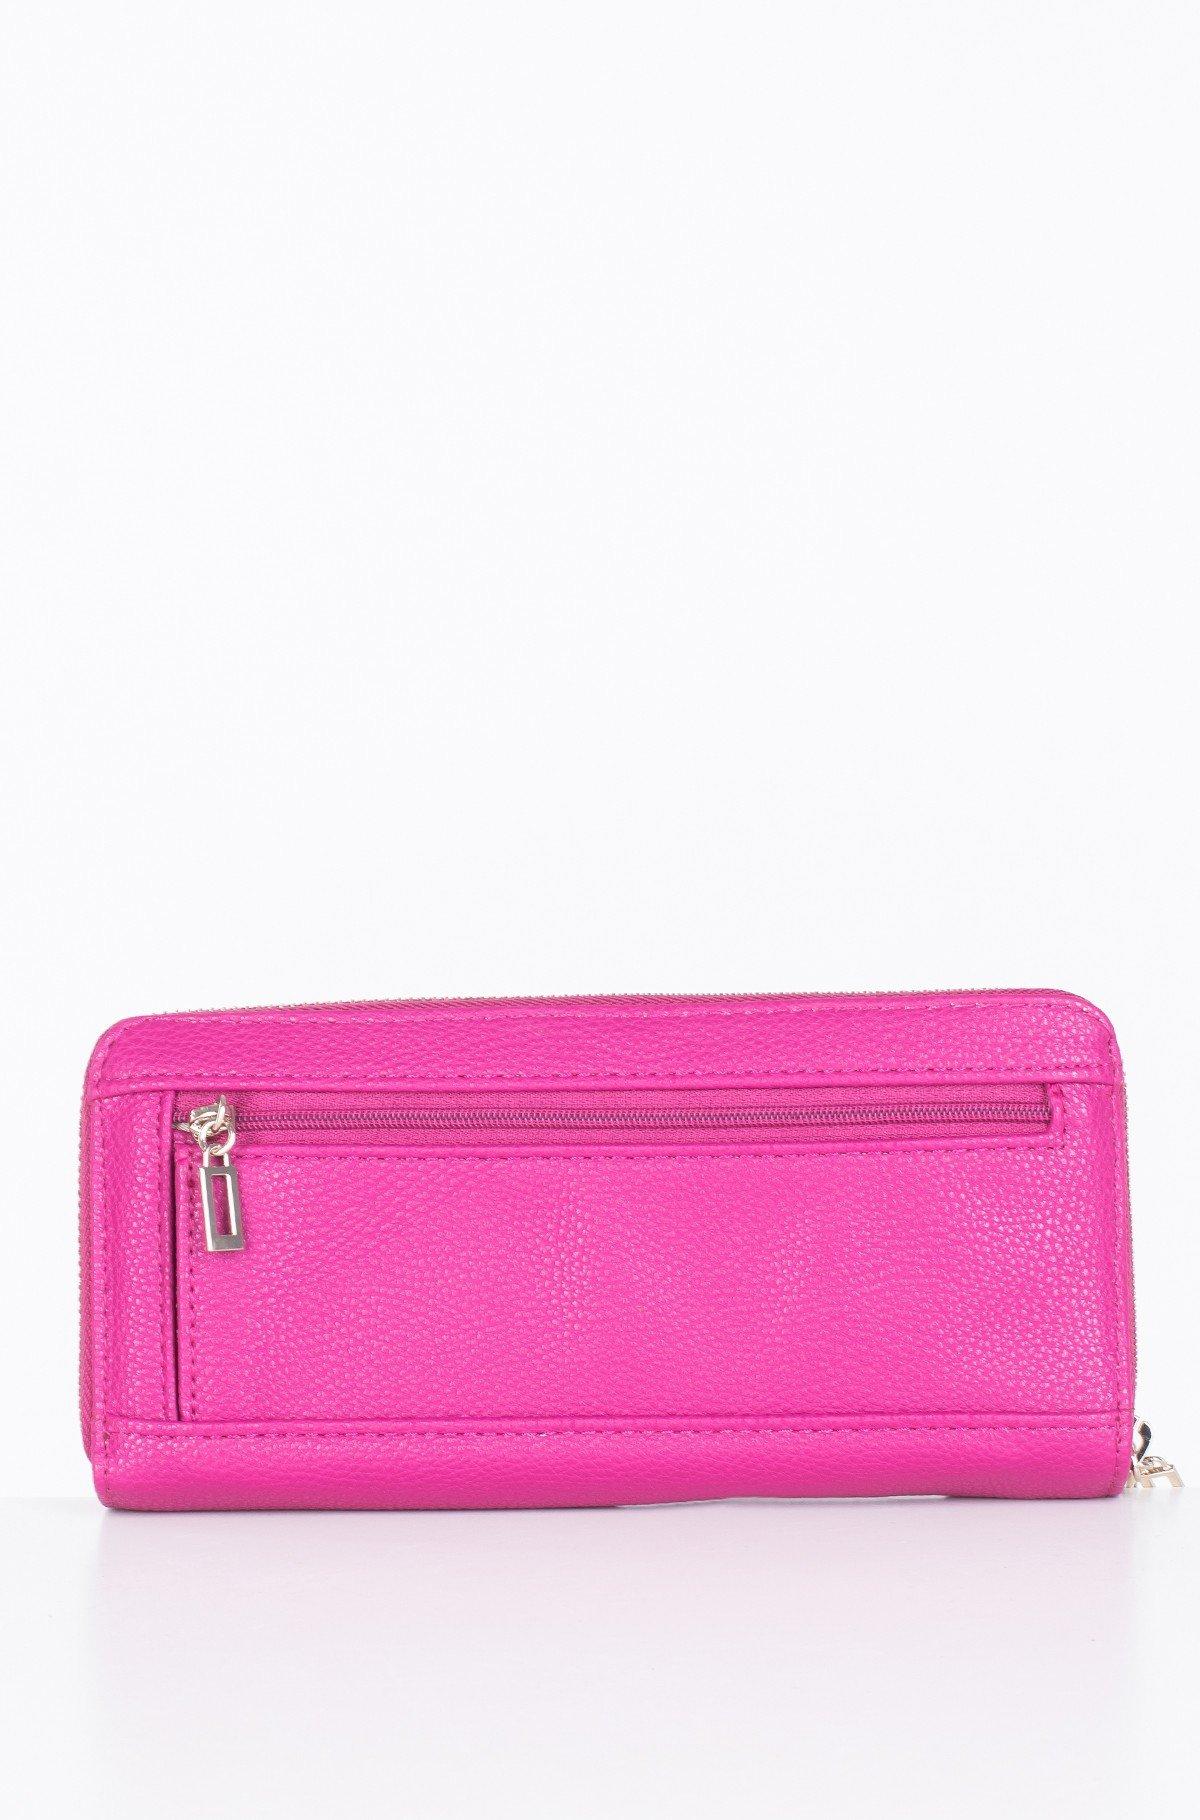 Wallet SWVG75 84460-full-2